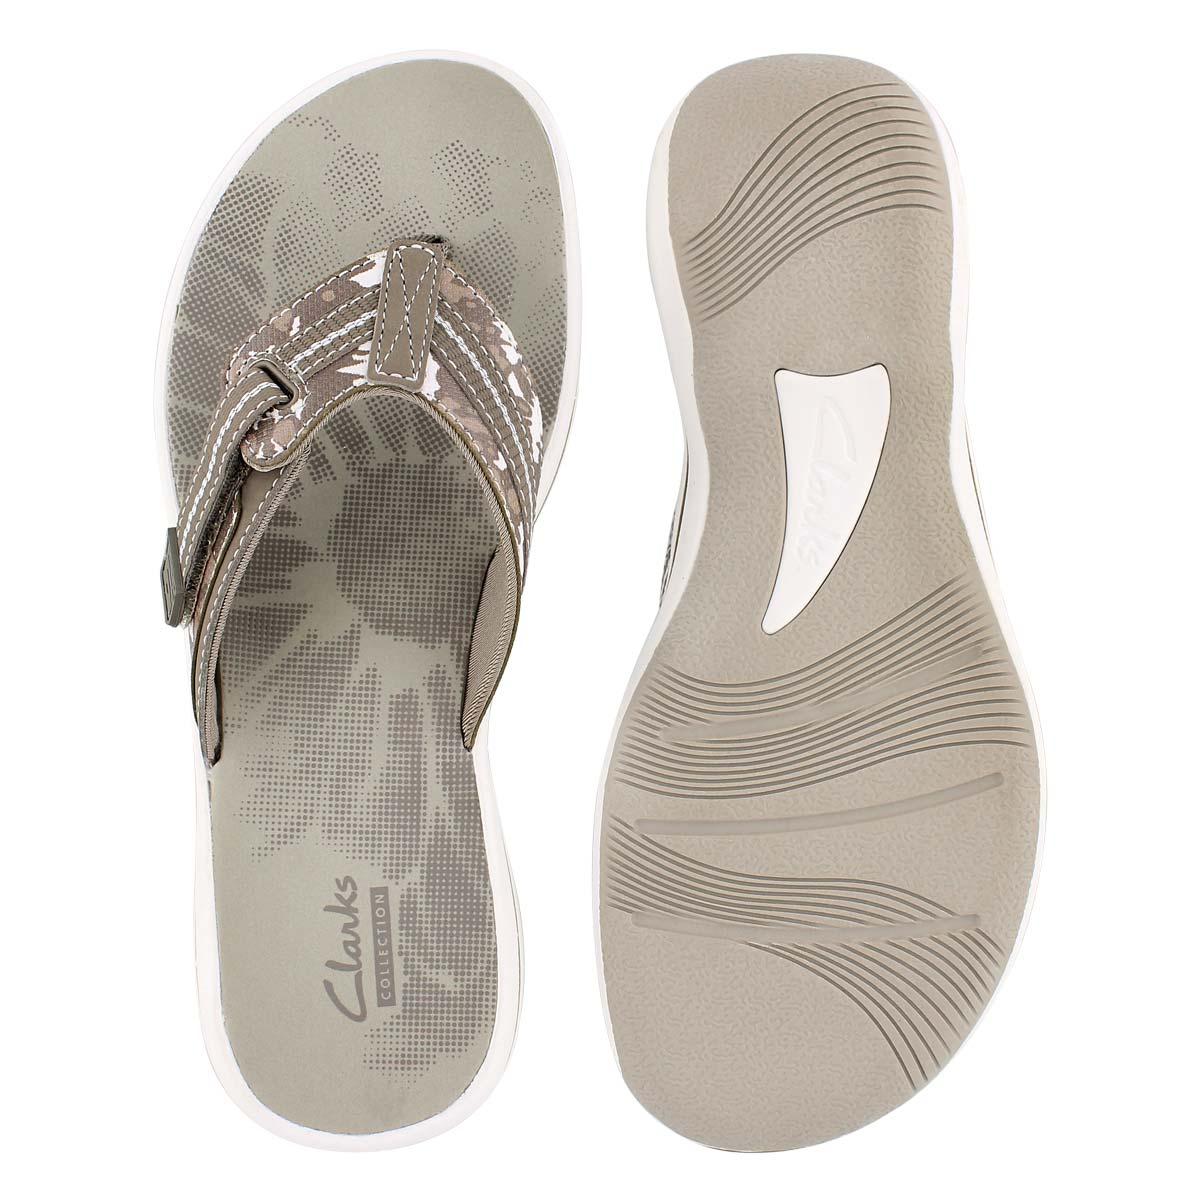 Sandale tong Brinkley Jazz, sauge, femme